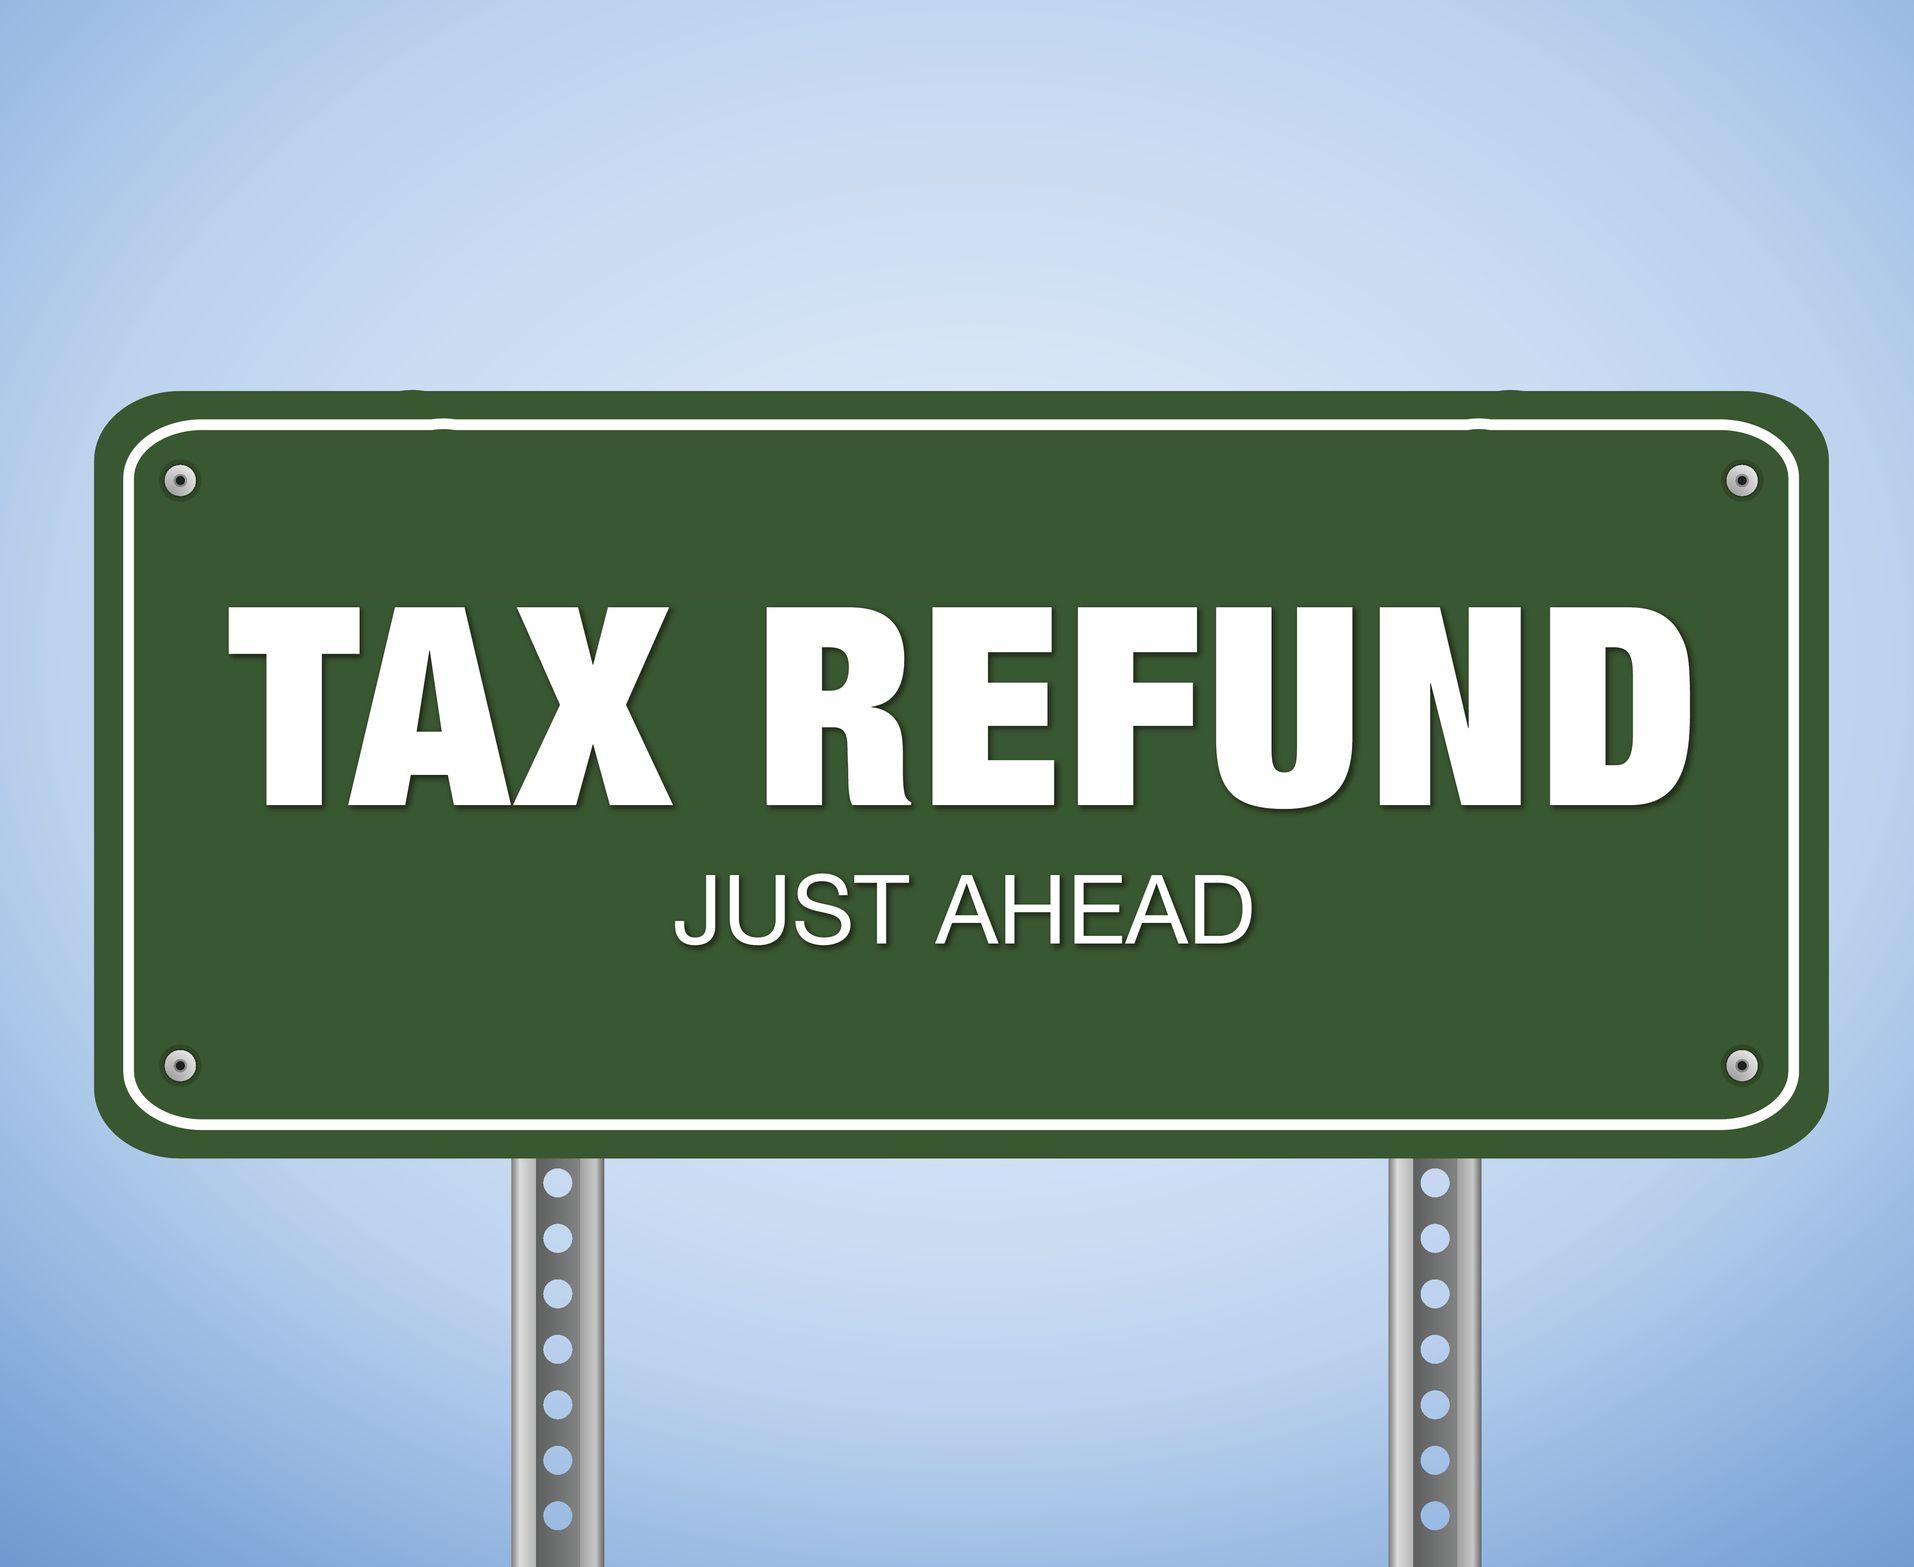 Tax refund ahead sign